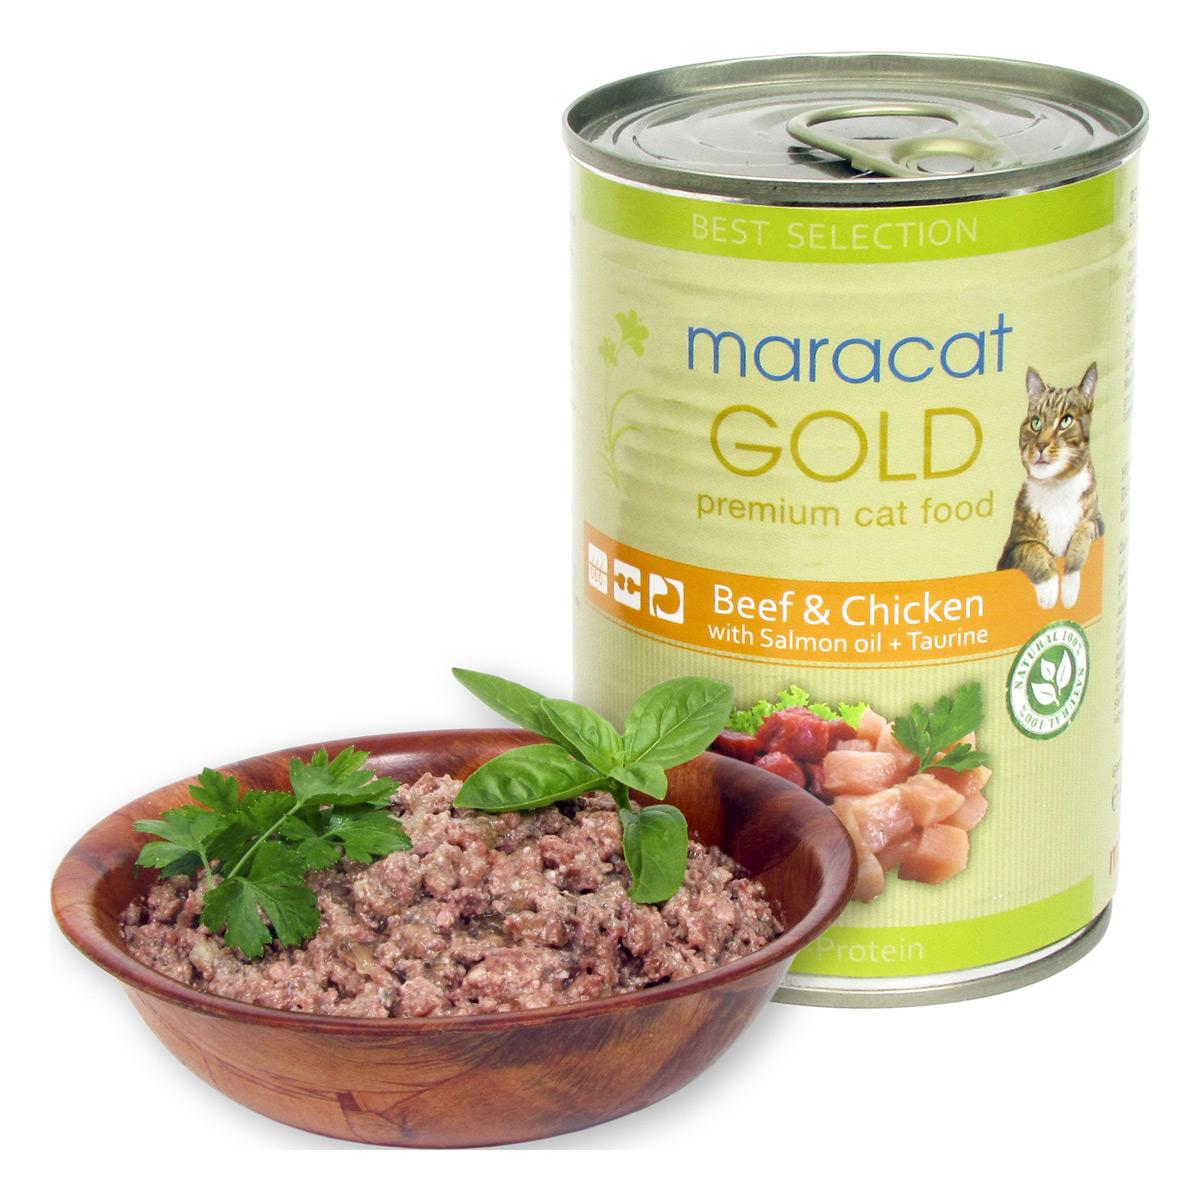 Maracat Gold Vita Si Pui, 400 G